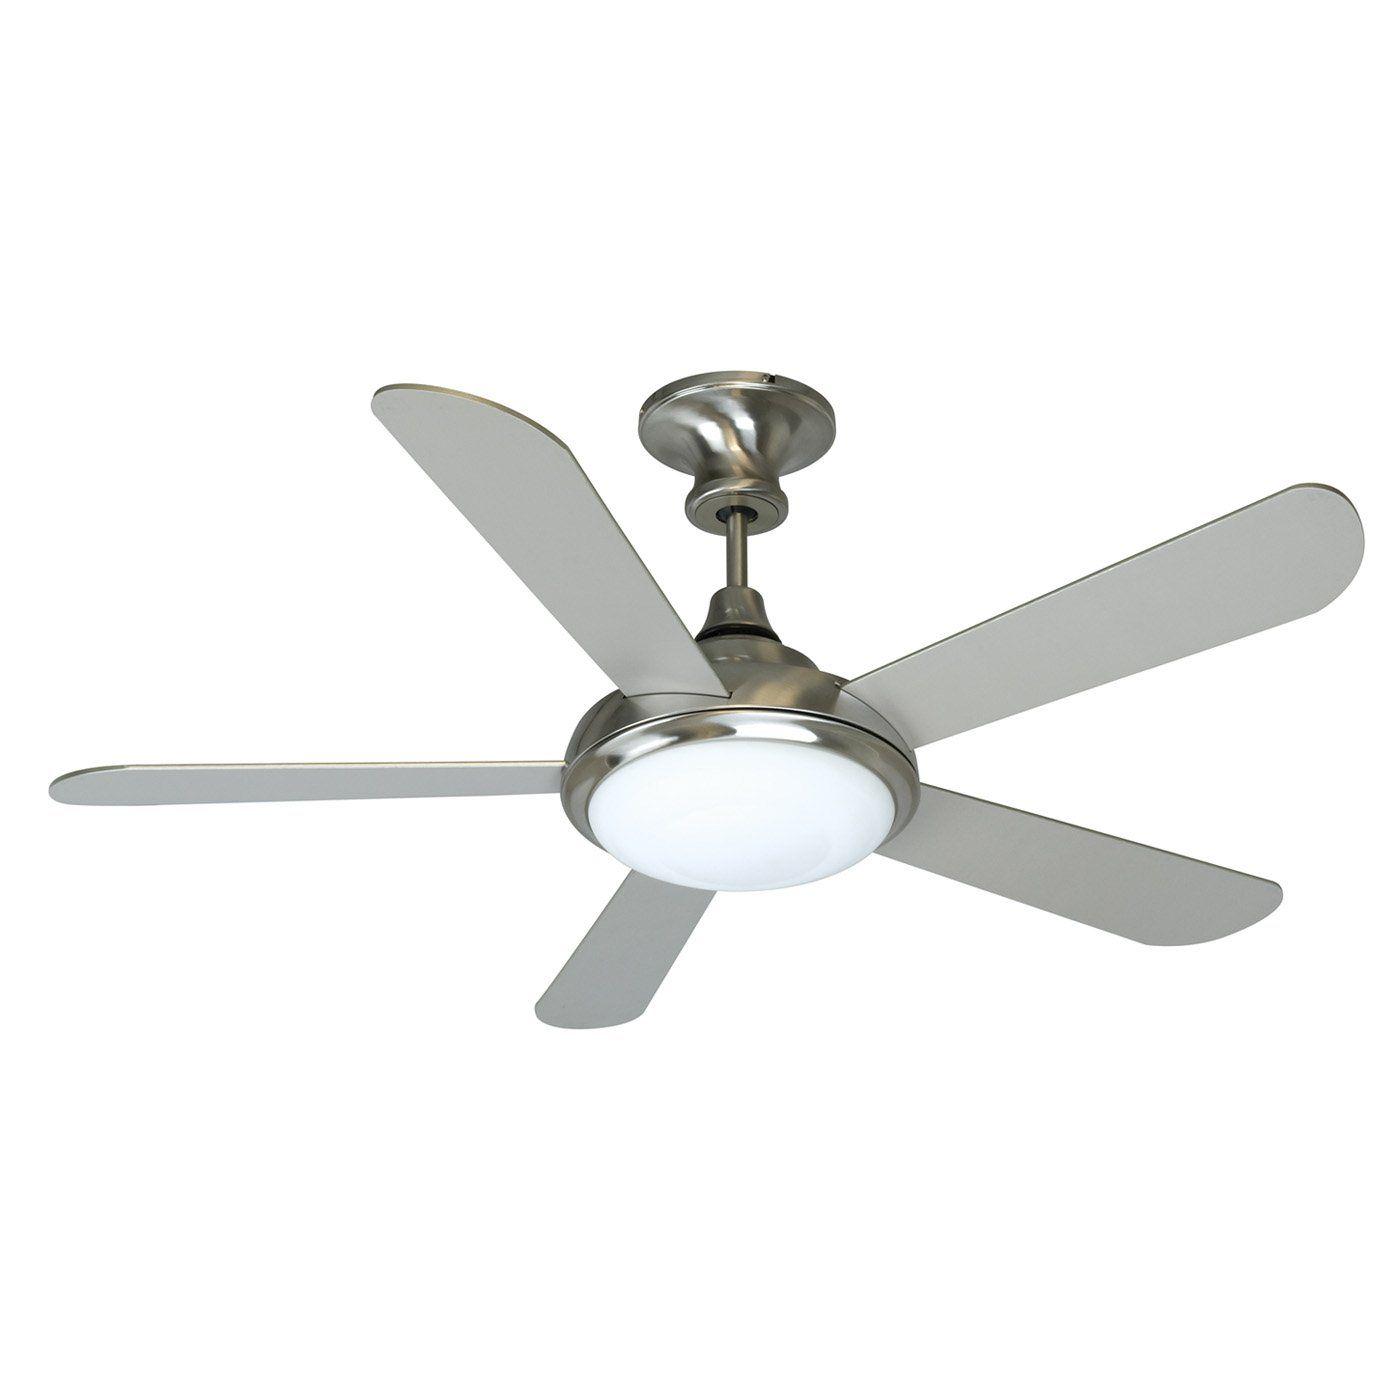 Westinghouse Alloy 42 In Indoor Brushed Nickel Ceiling Fan 7247300 Ceiling Fan Brushed Nickel Ceiling Fan Metal Ceiling